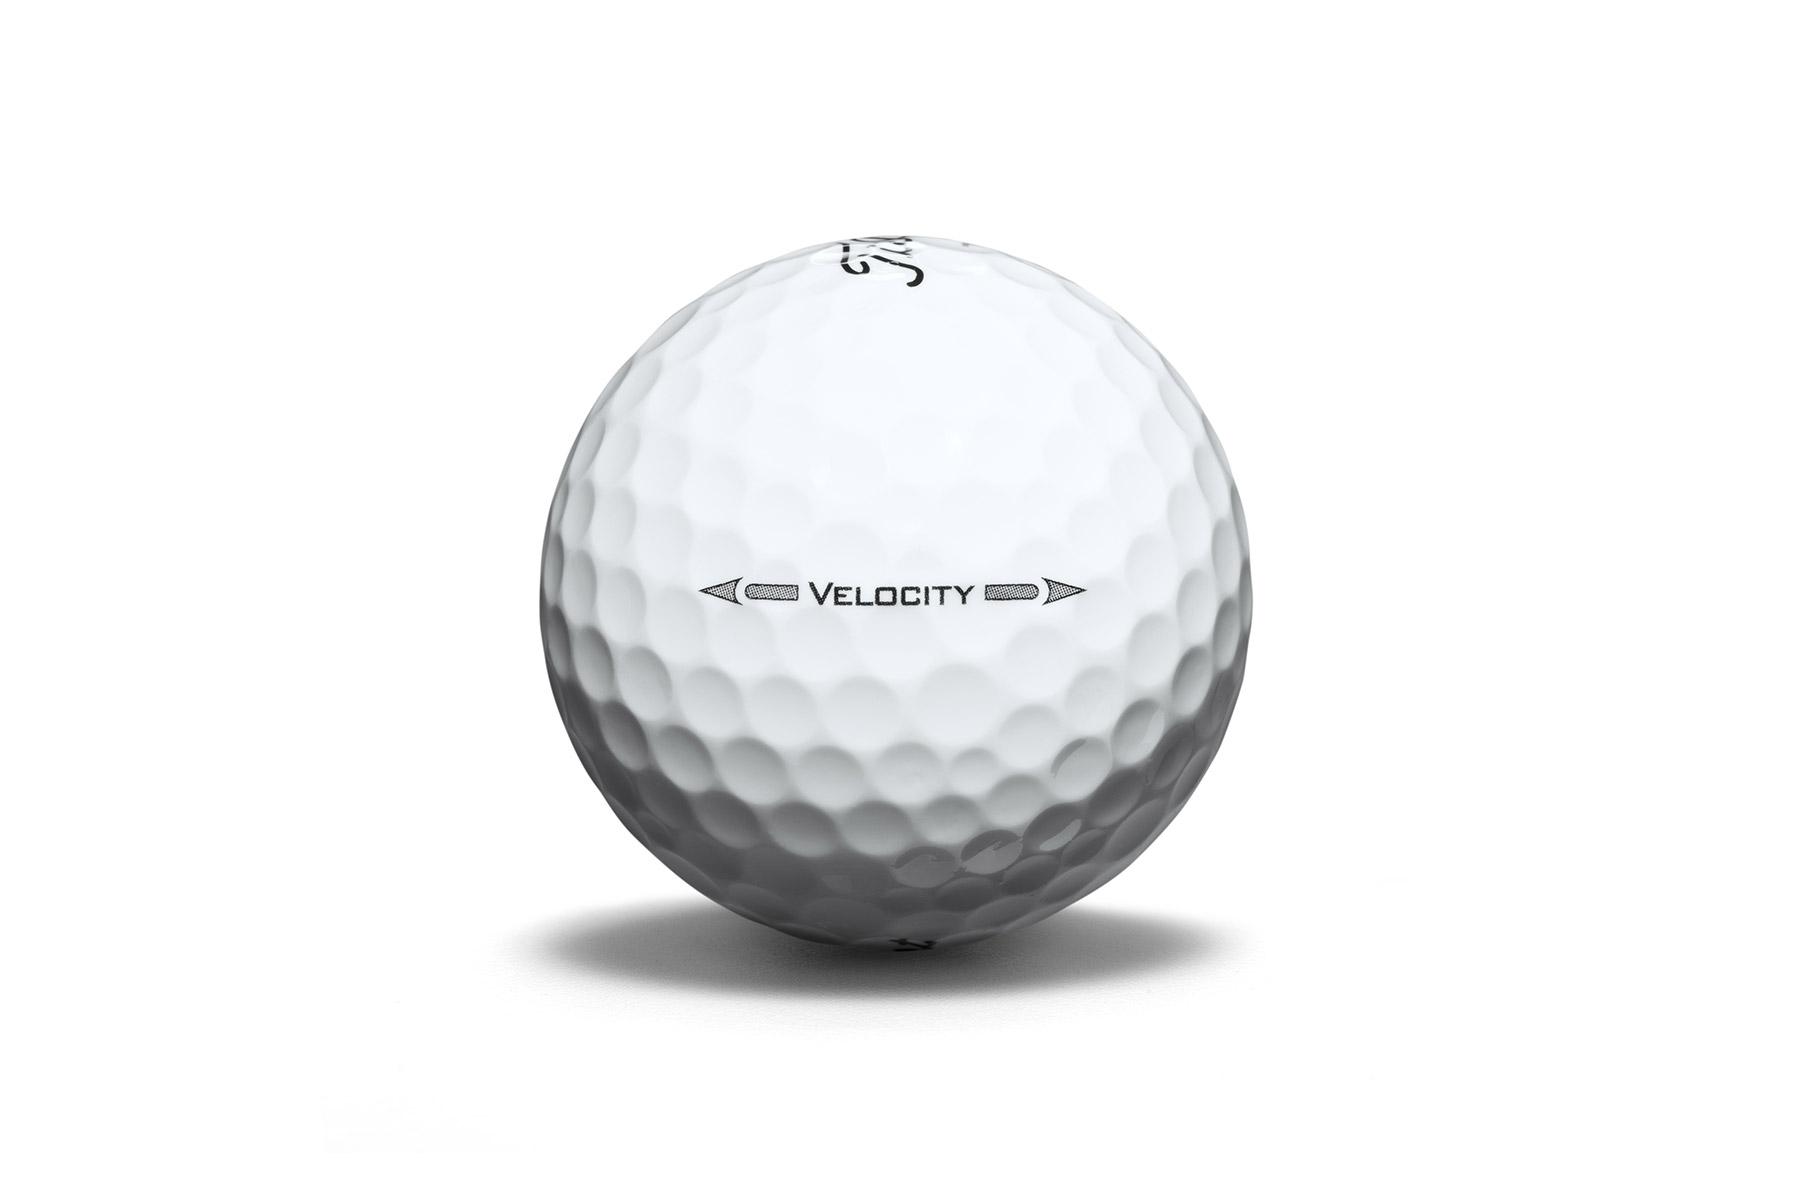 Titleist Velocity Double Digit 12 Golf Balls 2016   Online Golf